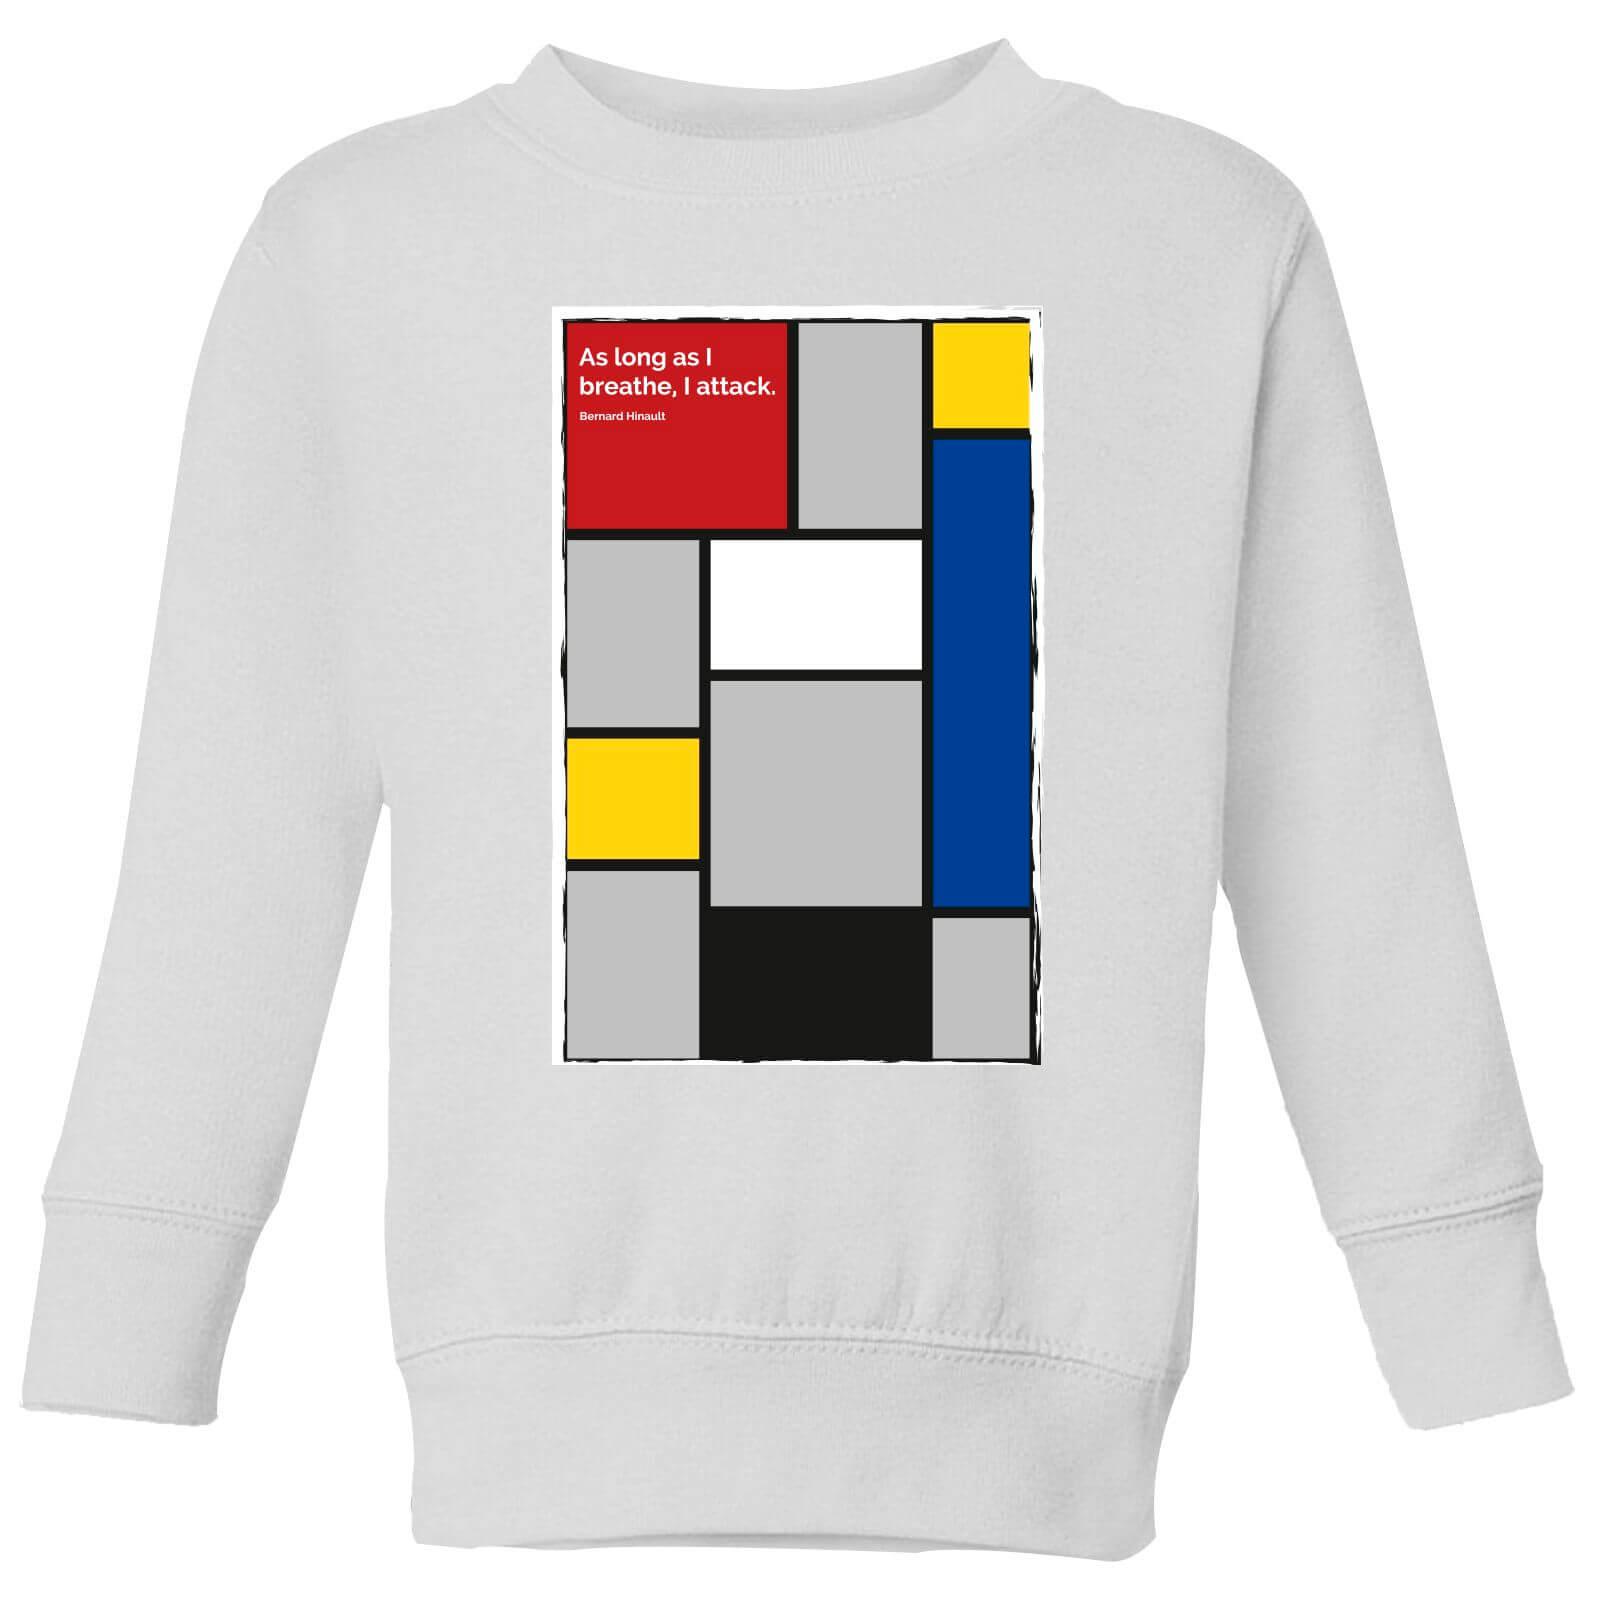 Summit Finish La Vie Claire Kids' Sweatshirt - White - 9-10 Years - White